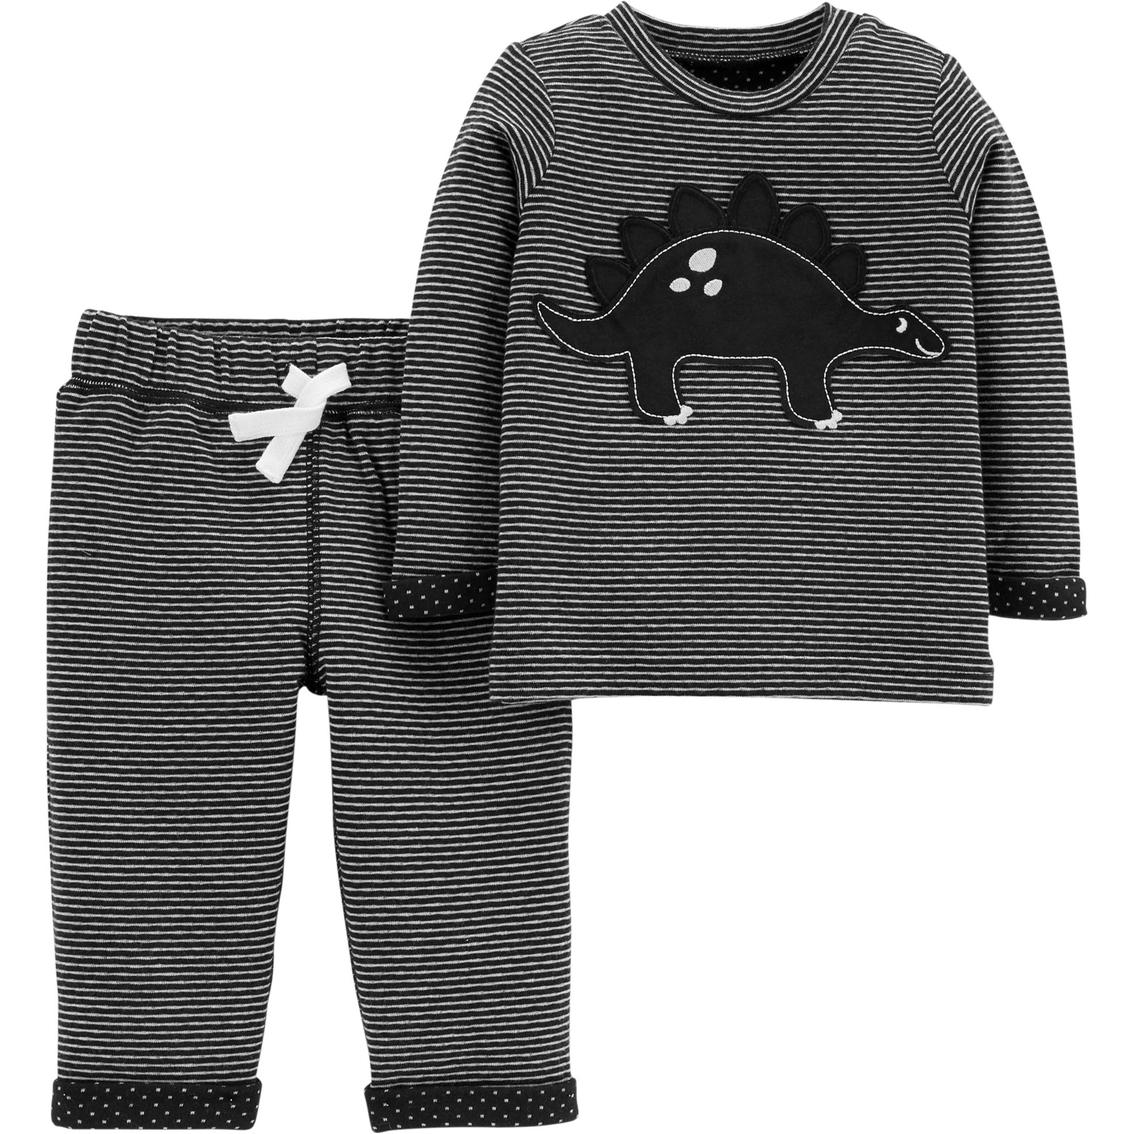 916f3a53c Carter s Infant Boys 2 Pc. Dinosaur Shirt And Reversible Pants Set ...